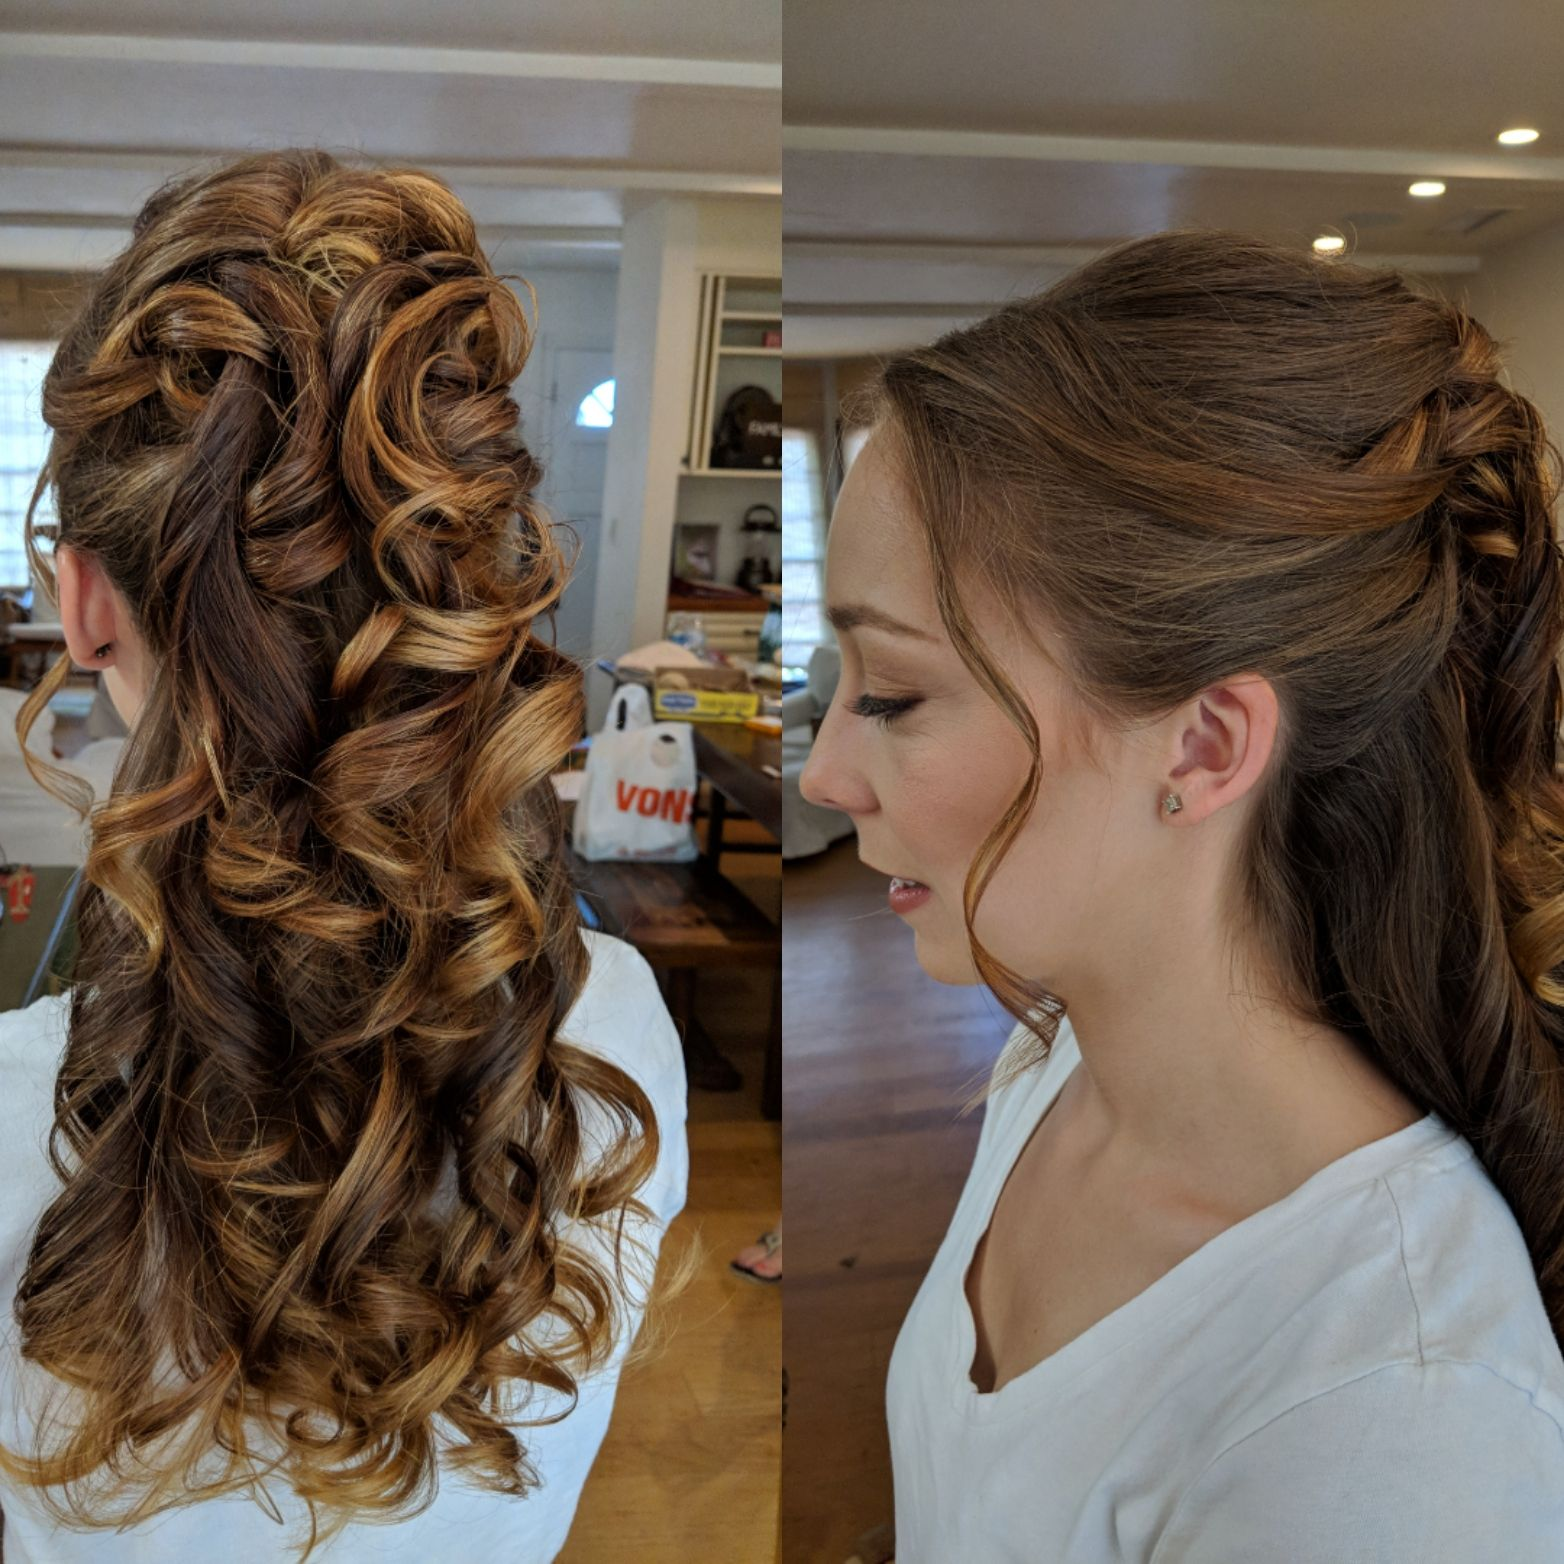 stacked pinned back curls showcasing her beautiful caramel